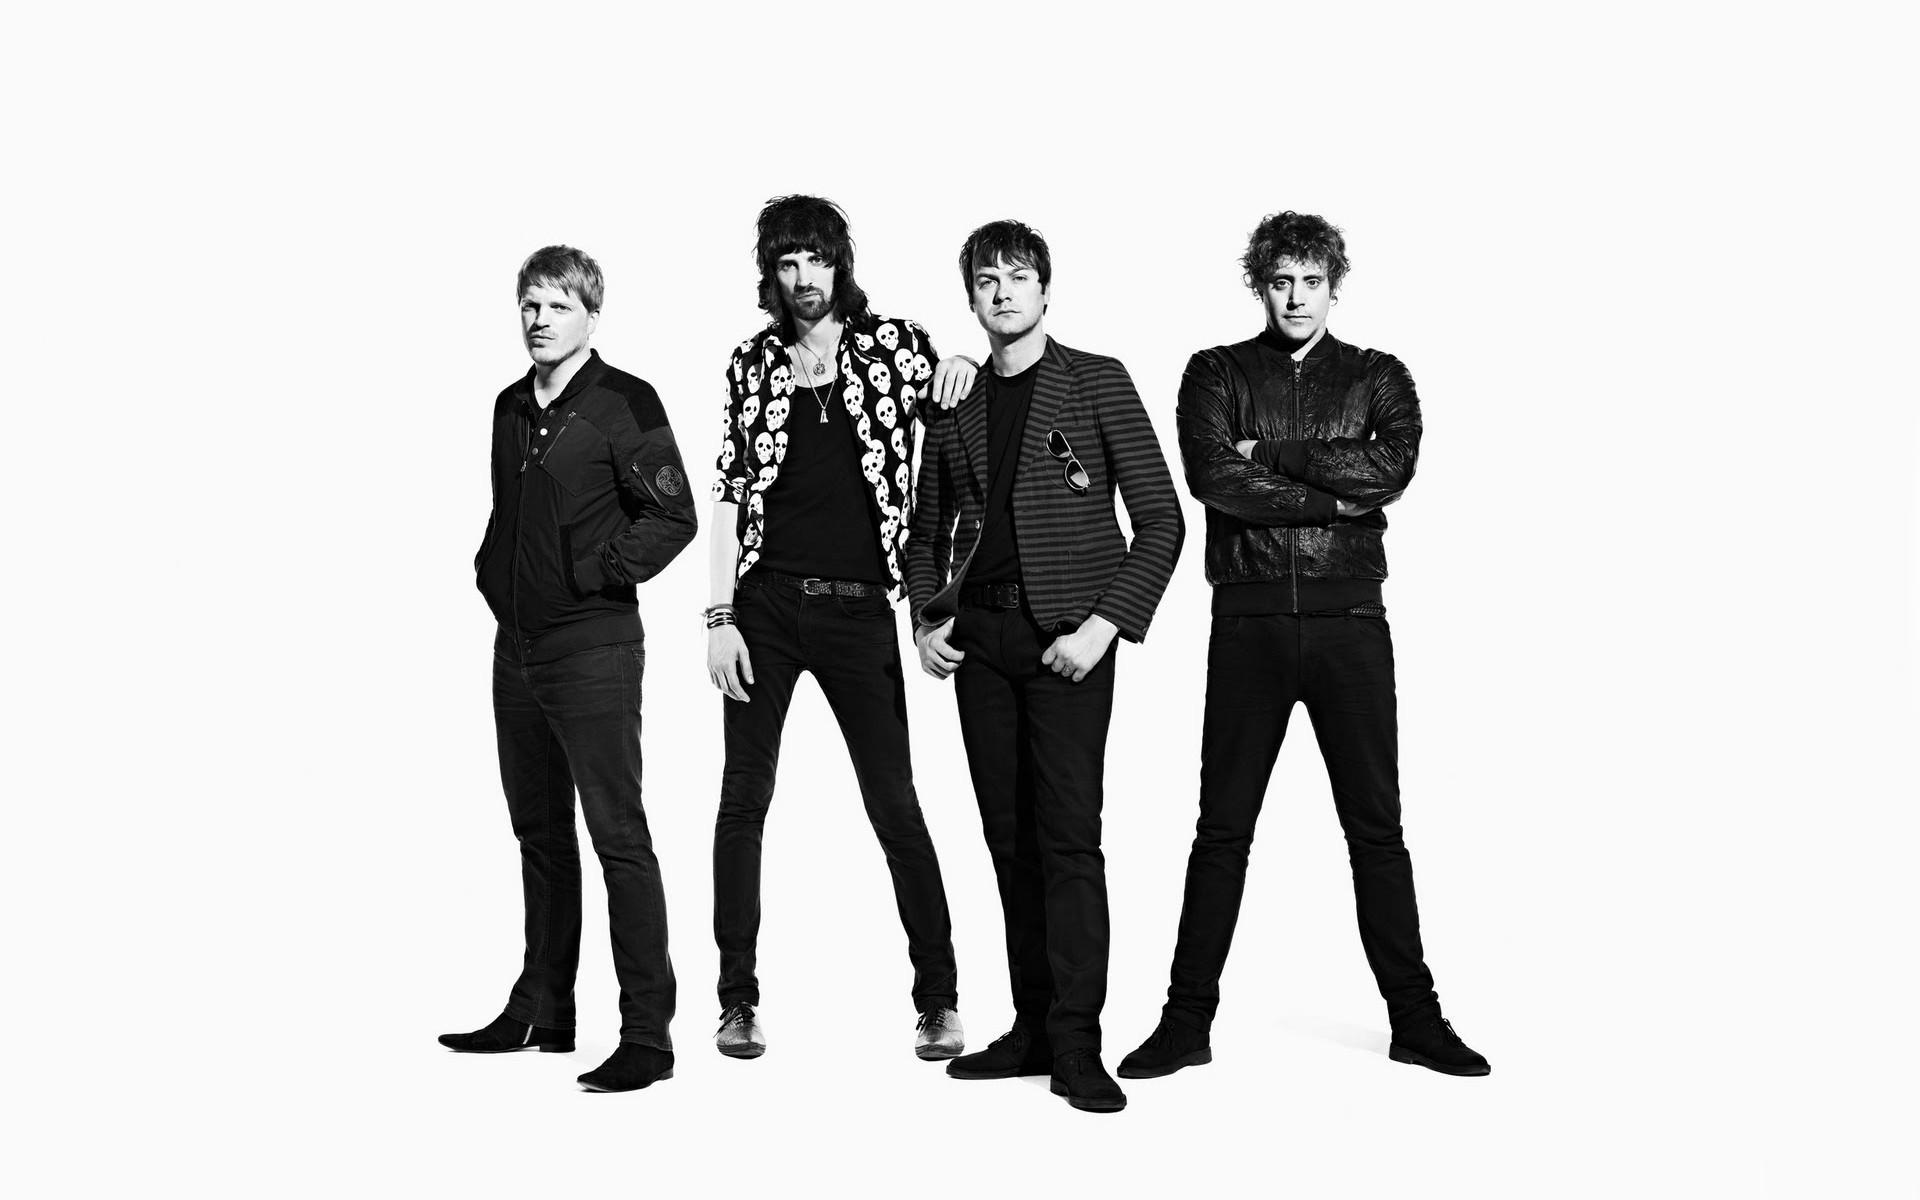 men Grayscale British Music Bands White Background Kasabian 1920x1200